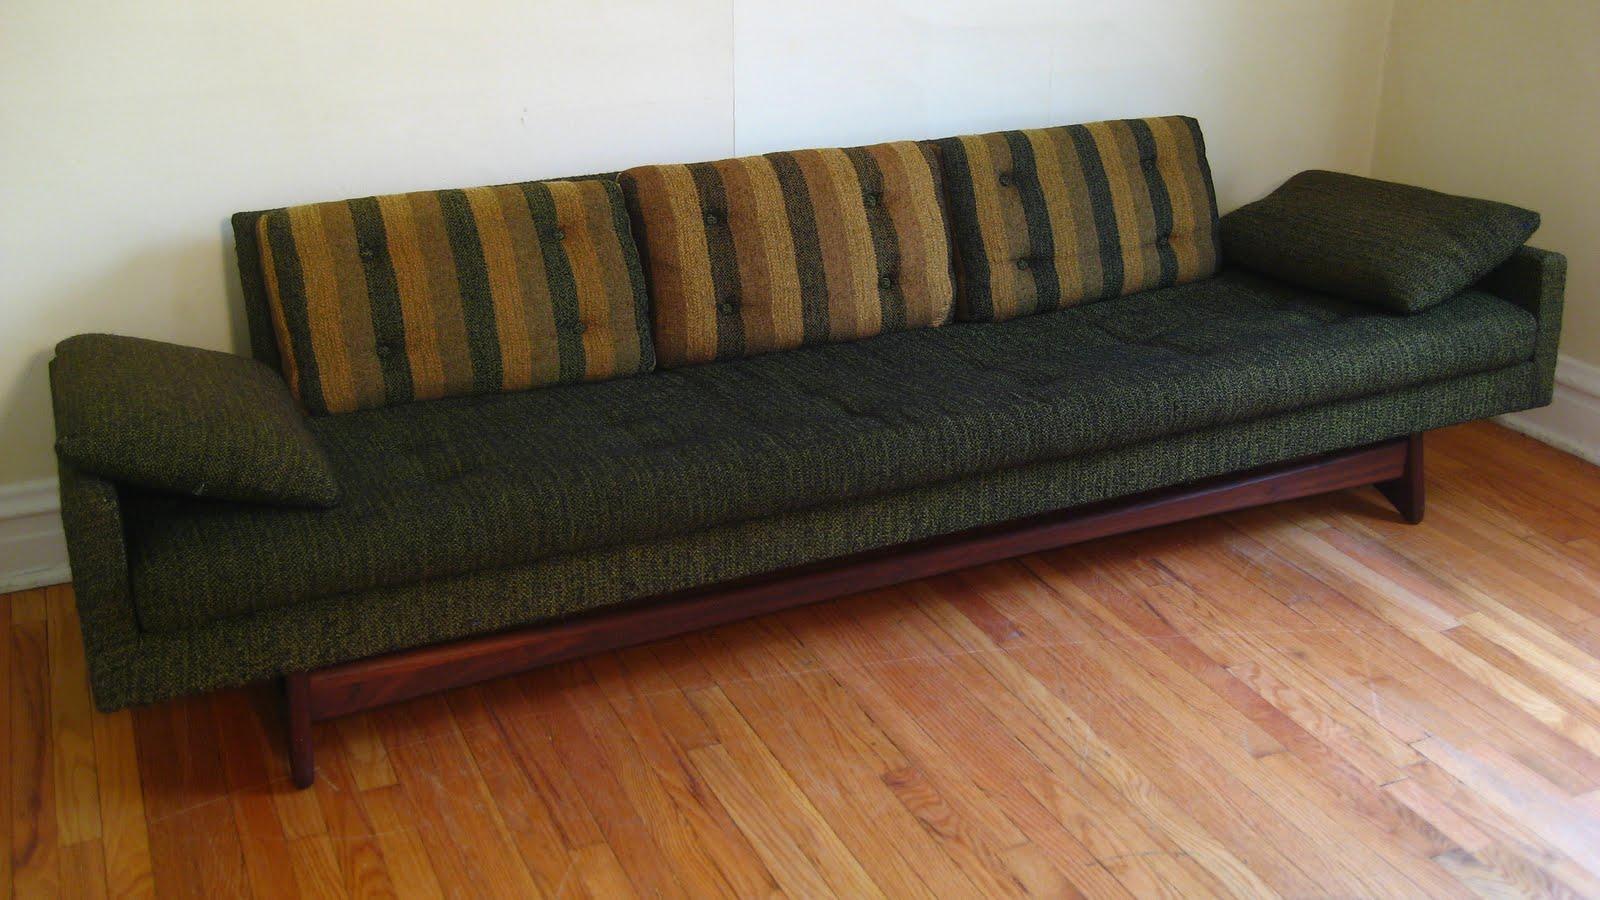 Flatout Design Adrian Pearsall For Craft Associates Sofa